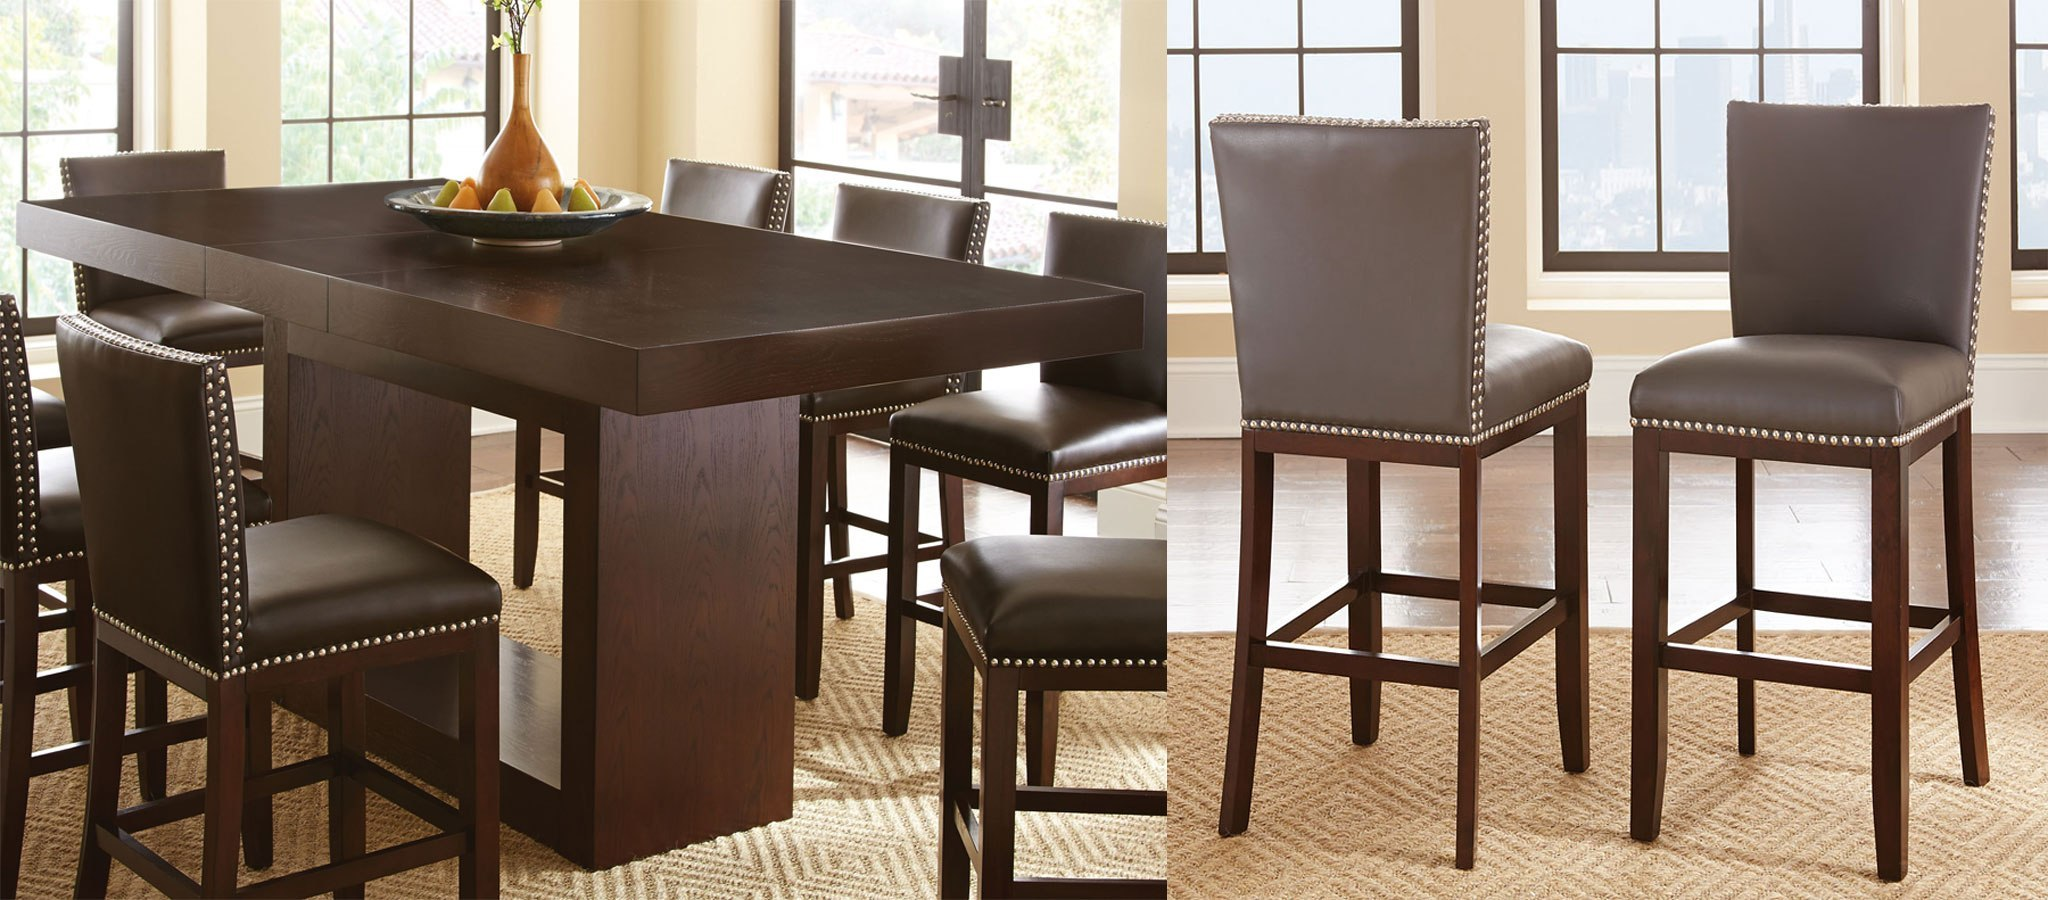 Antonio Counter Height Dining Set W Gray Tiffany Chairs